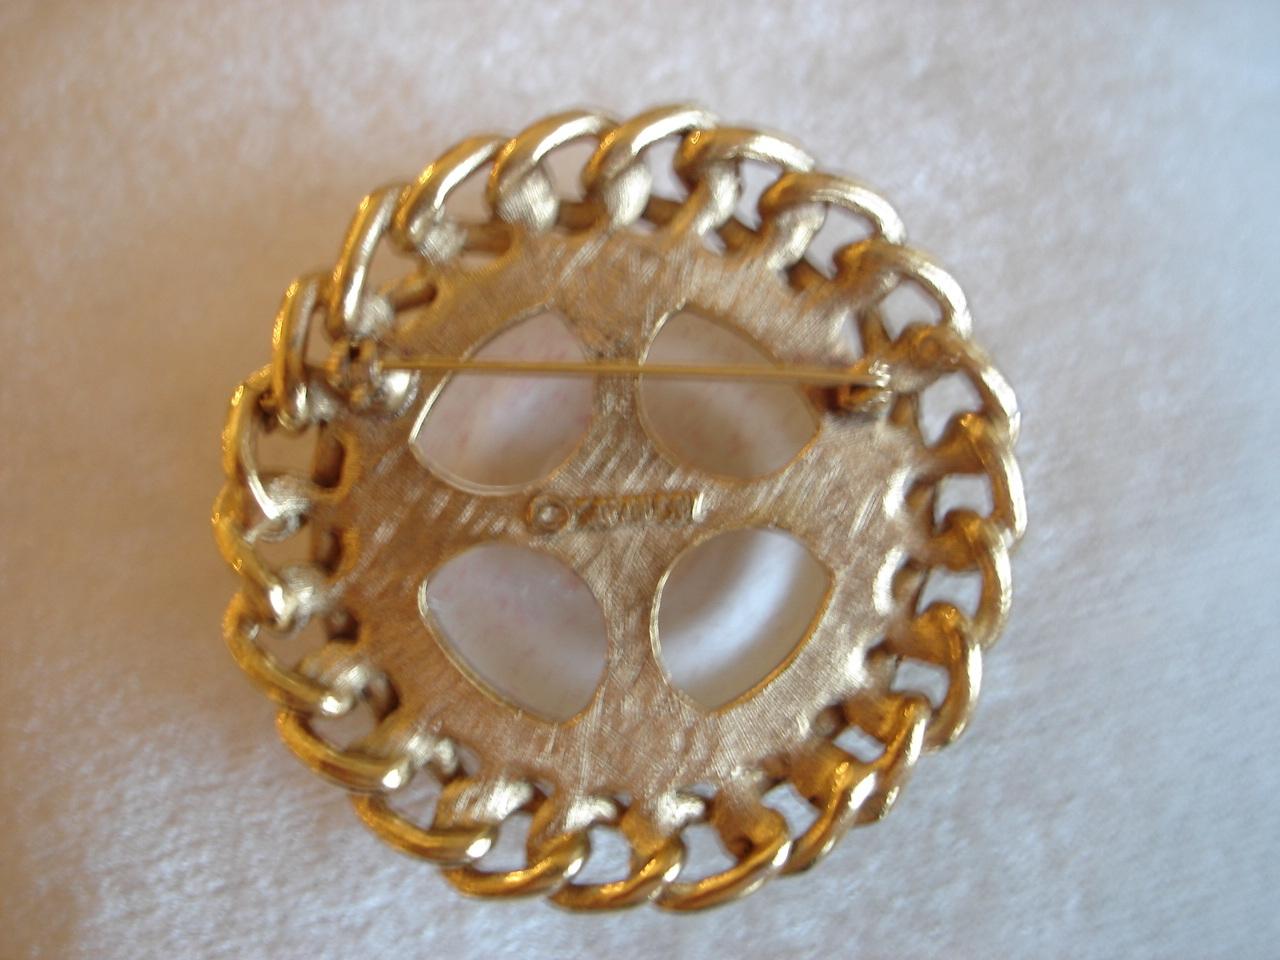 Vintage Sarah Coventry Lg Textured Sim Pearl, Goldtone Link